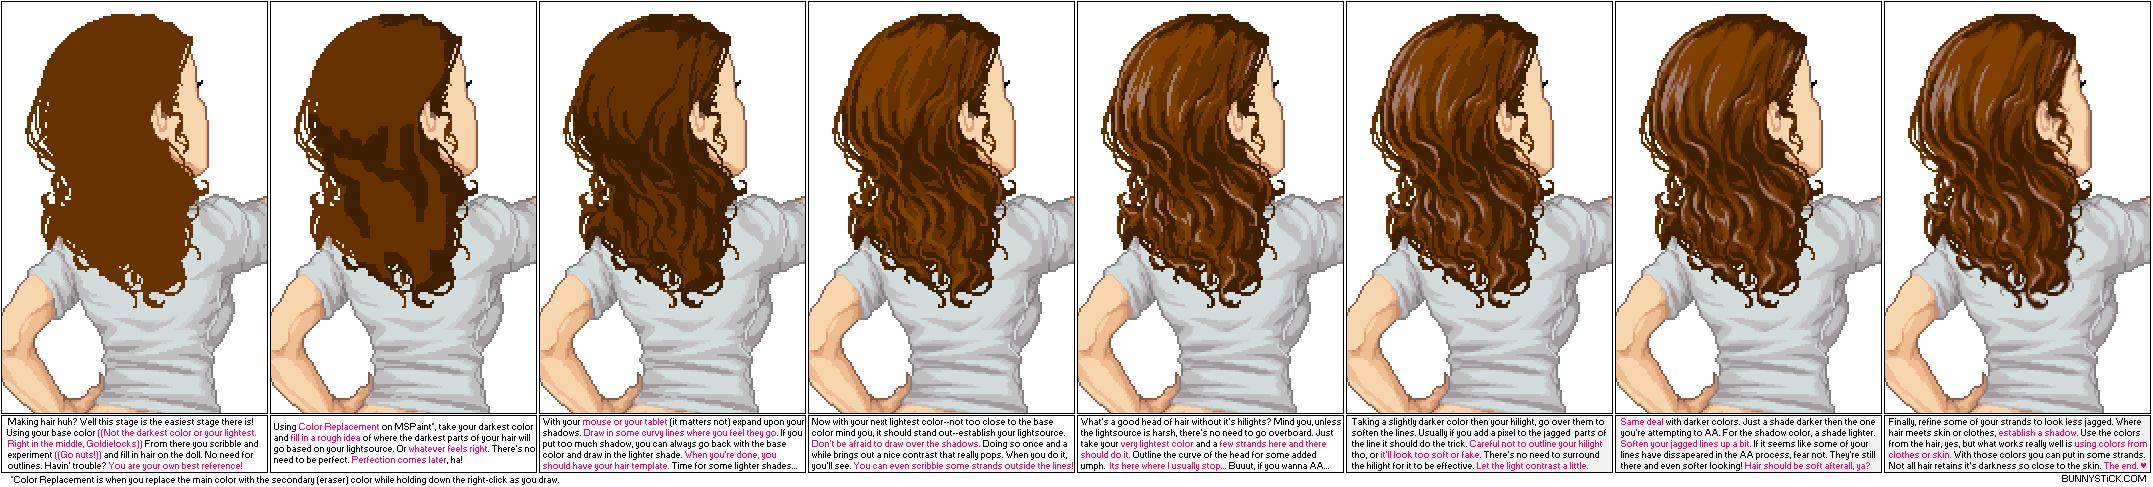 Drawn pixel art doll Silverwind3D by Tutorials Pixel DeviantArt